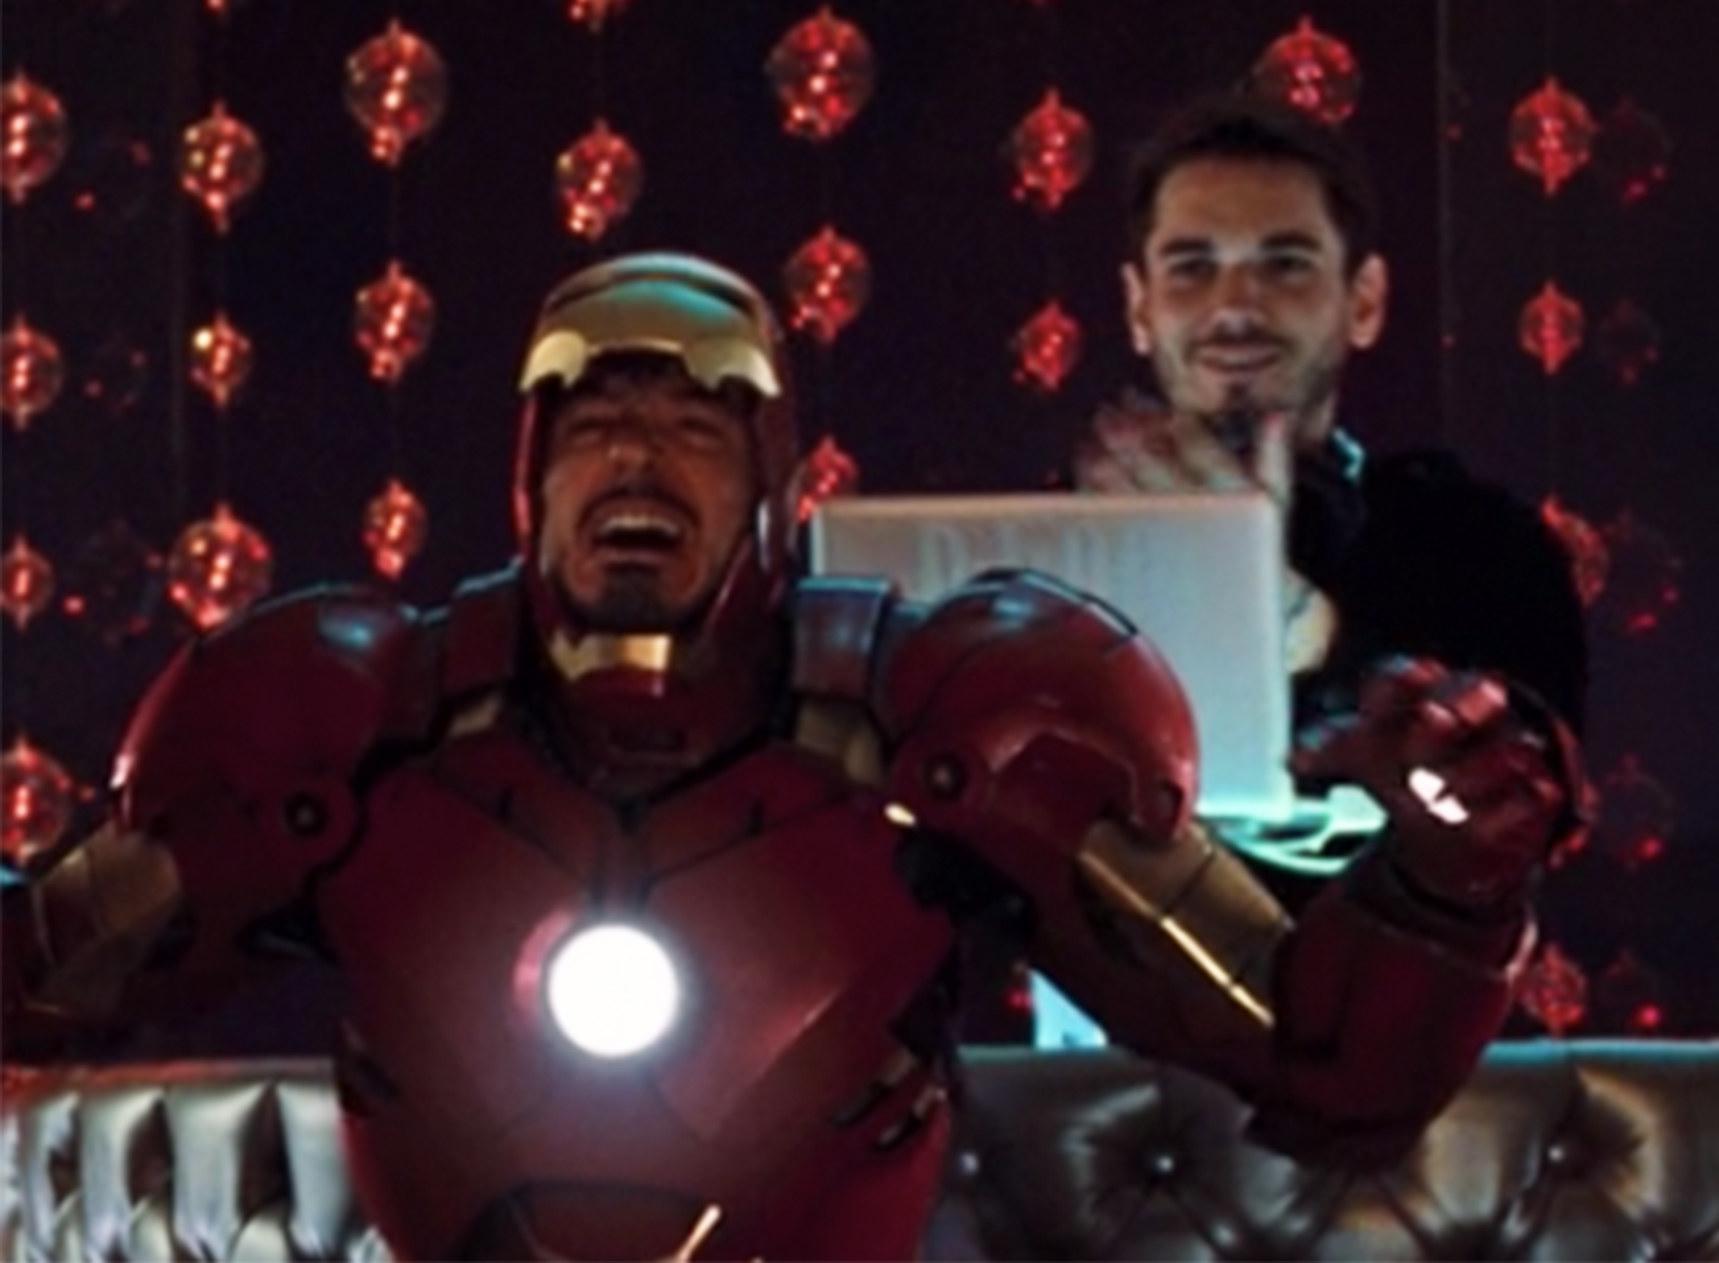 DJ AM cheers behind Tony Stark